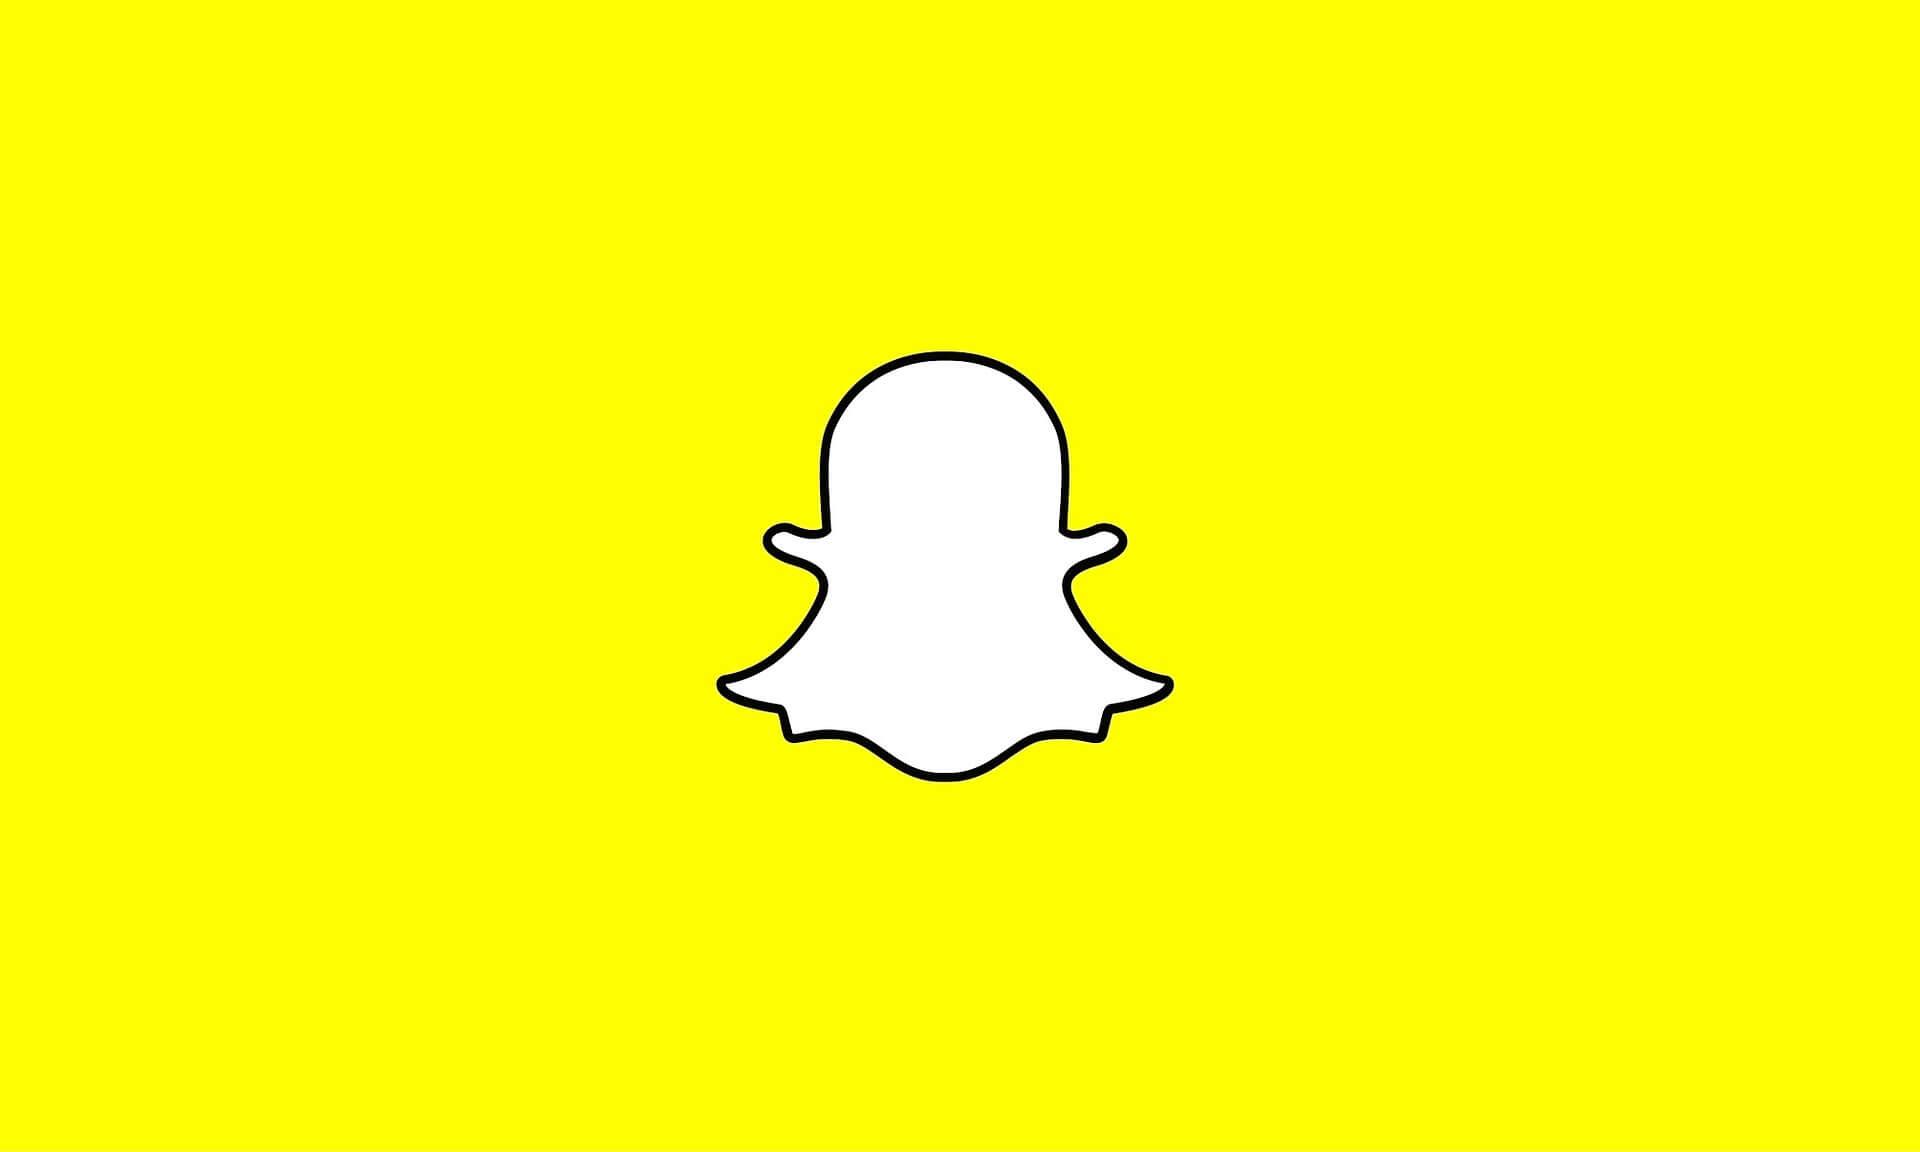 <p><strong>Snapchat</strong></p>